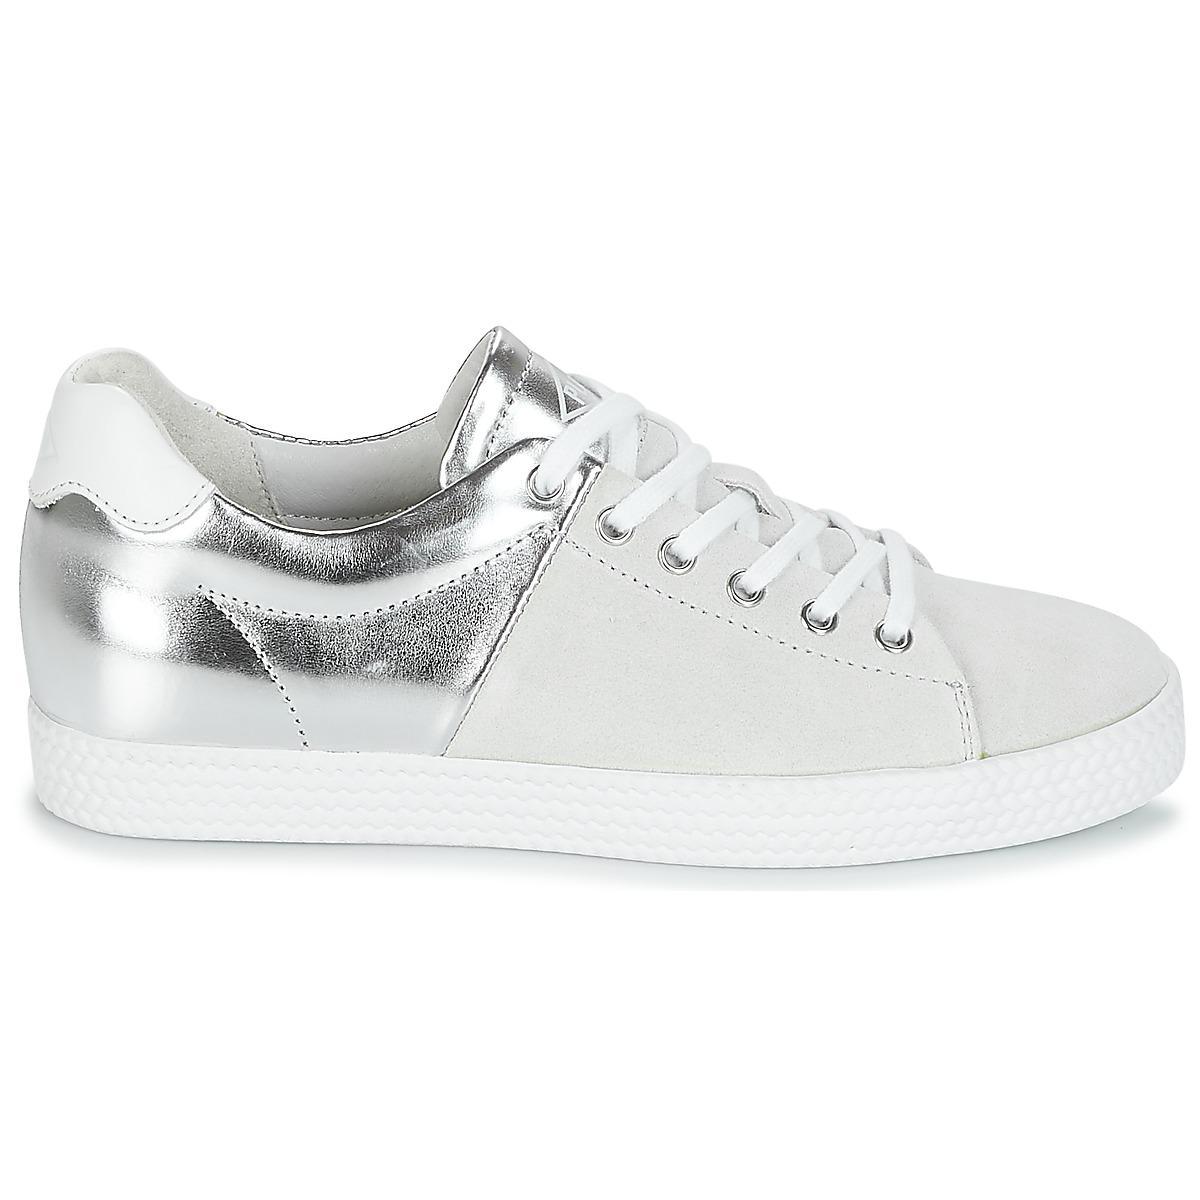 ShoestrainersIn By Kate Lyst Palladium White Pldm X8P0wknO